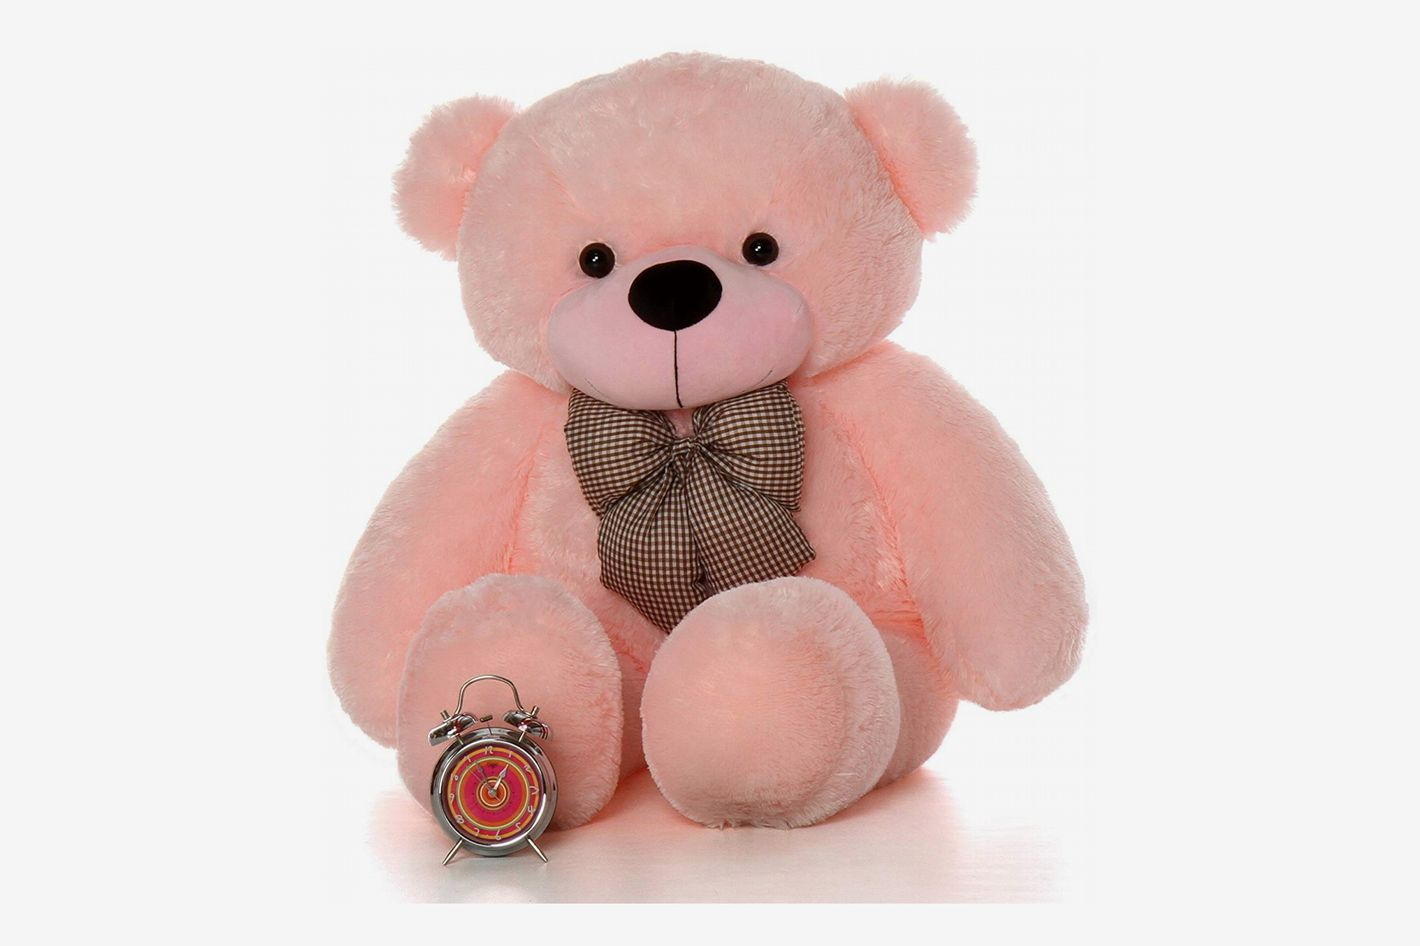 Giant Teddy - Plush Teddy Bear, 4 Feet Tall, Pink